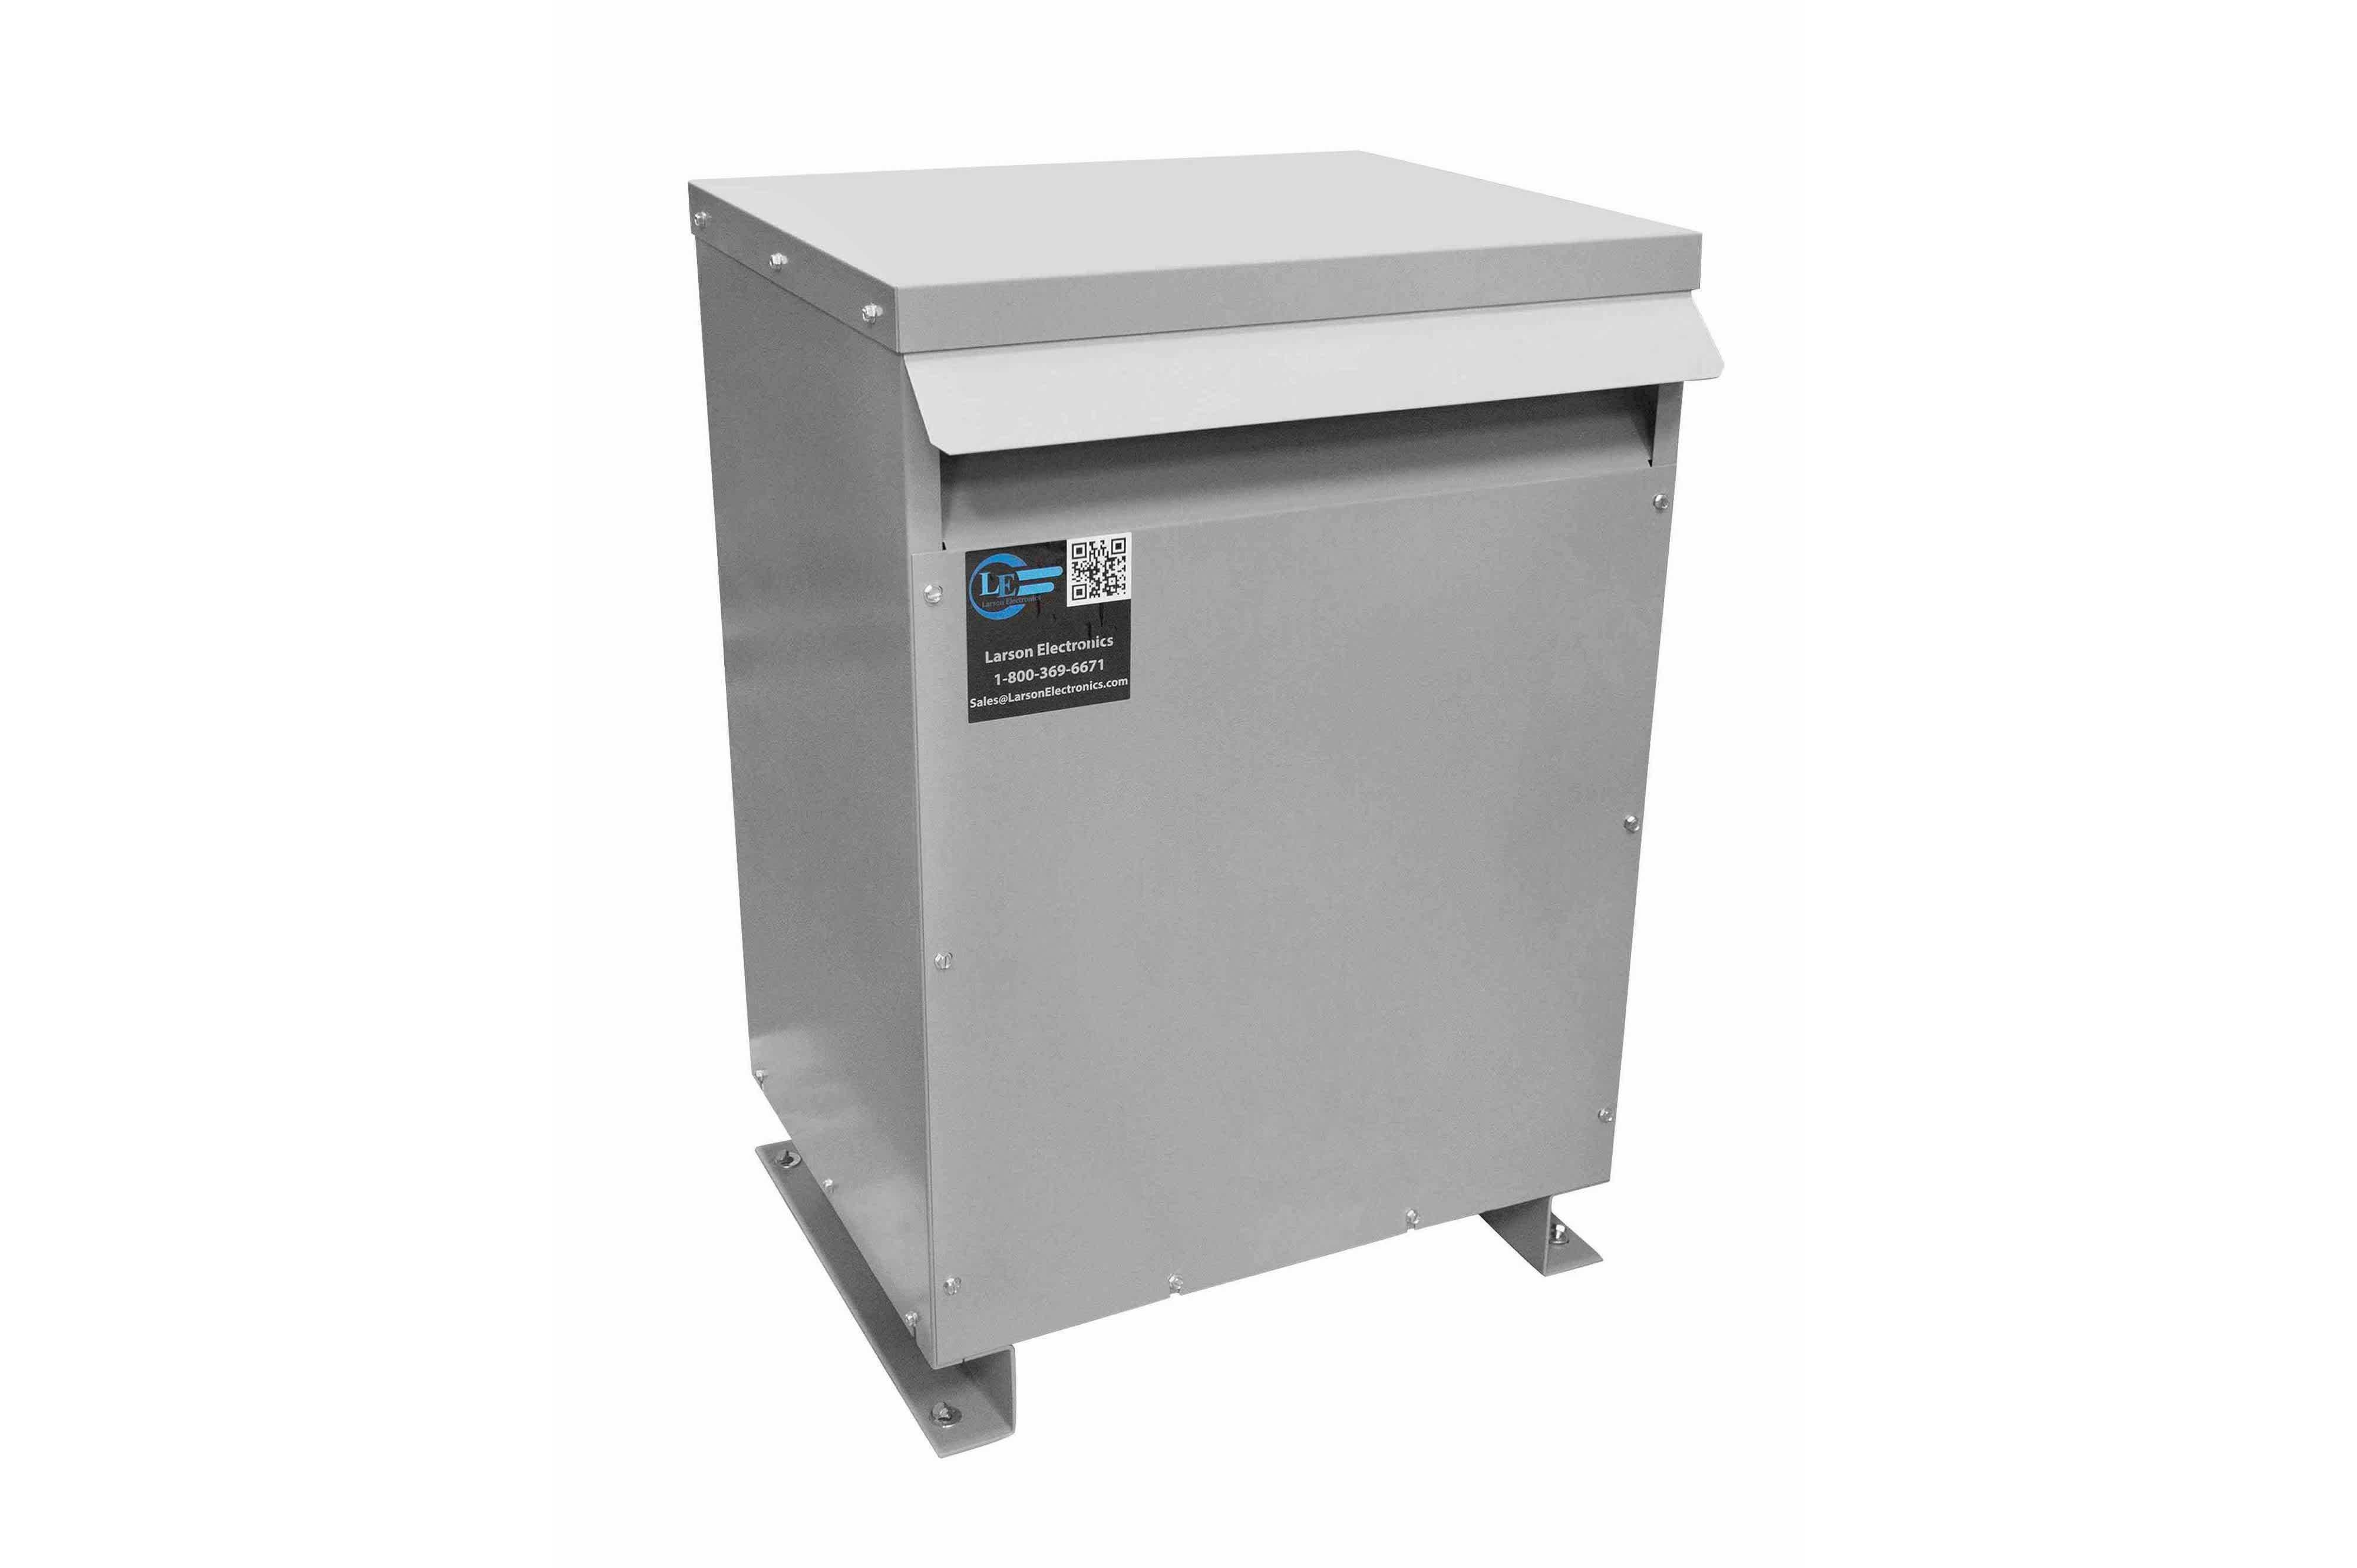 50 kVA 3PH Isolation Transformer, 220V Wye Primary, 208Y/120 Wye-N Secondary, N3R, Ventilated, 60 Hz